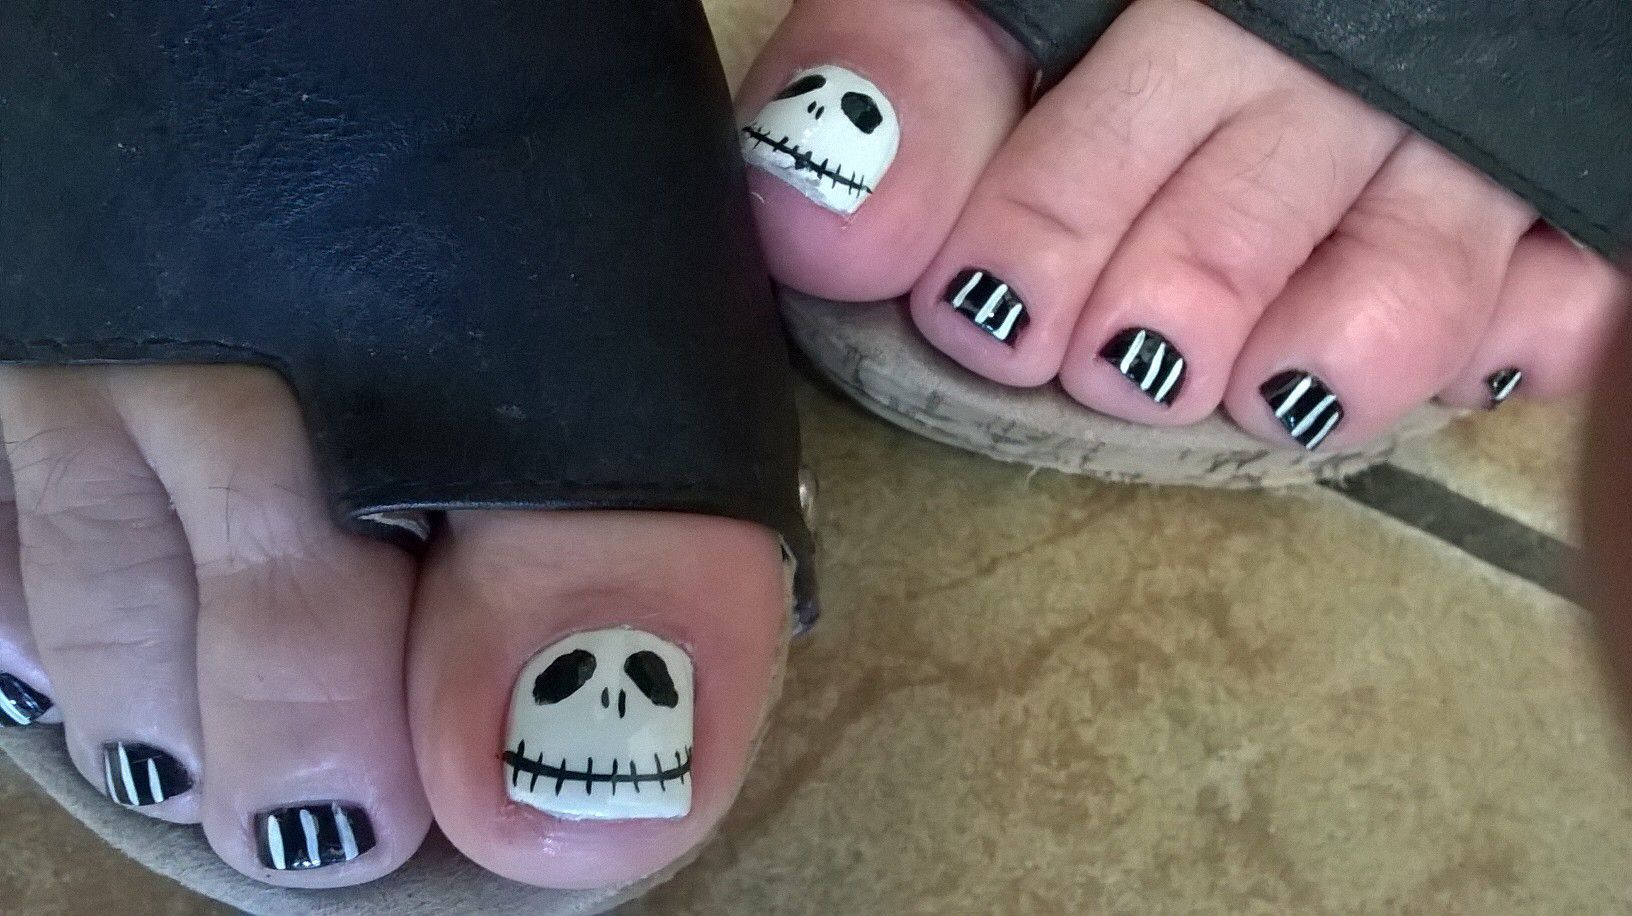 Goulash toes